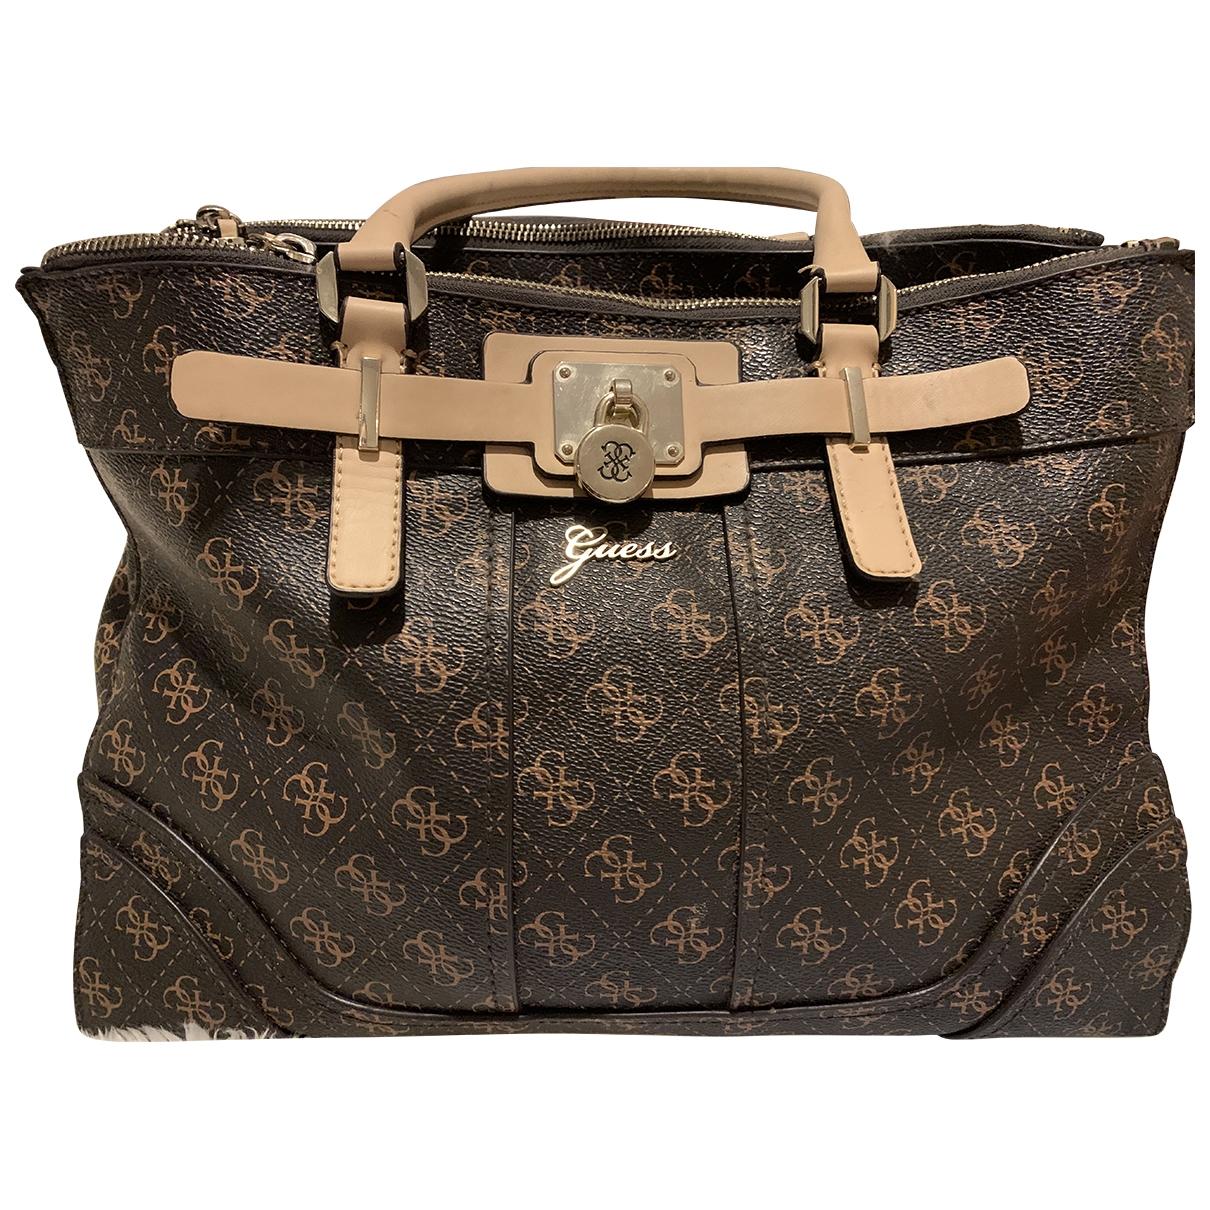 Guess \N Brown handbag for Women \N